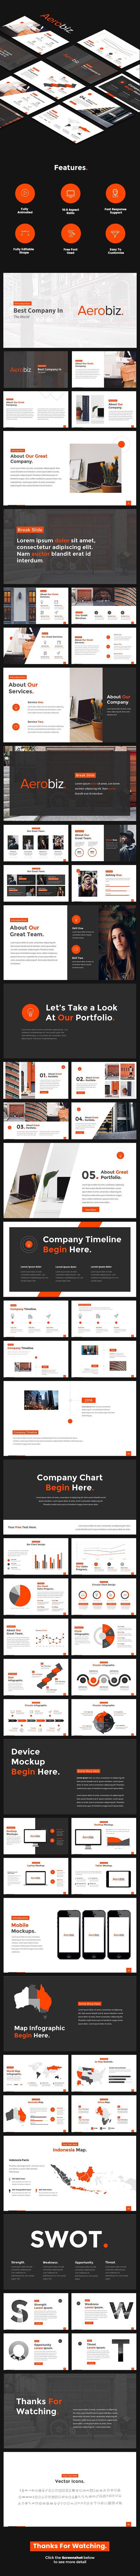 Aerobiz - Professional Business Google Slides Template - Google Slides Presentation Templates